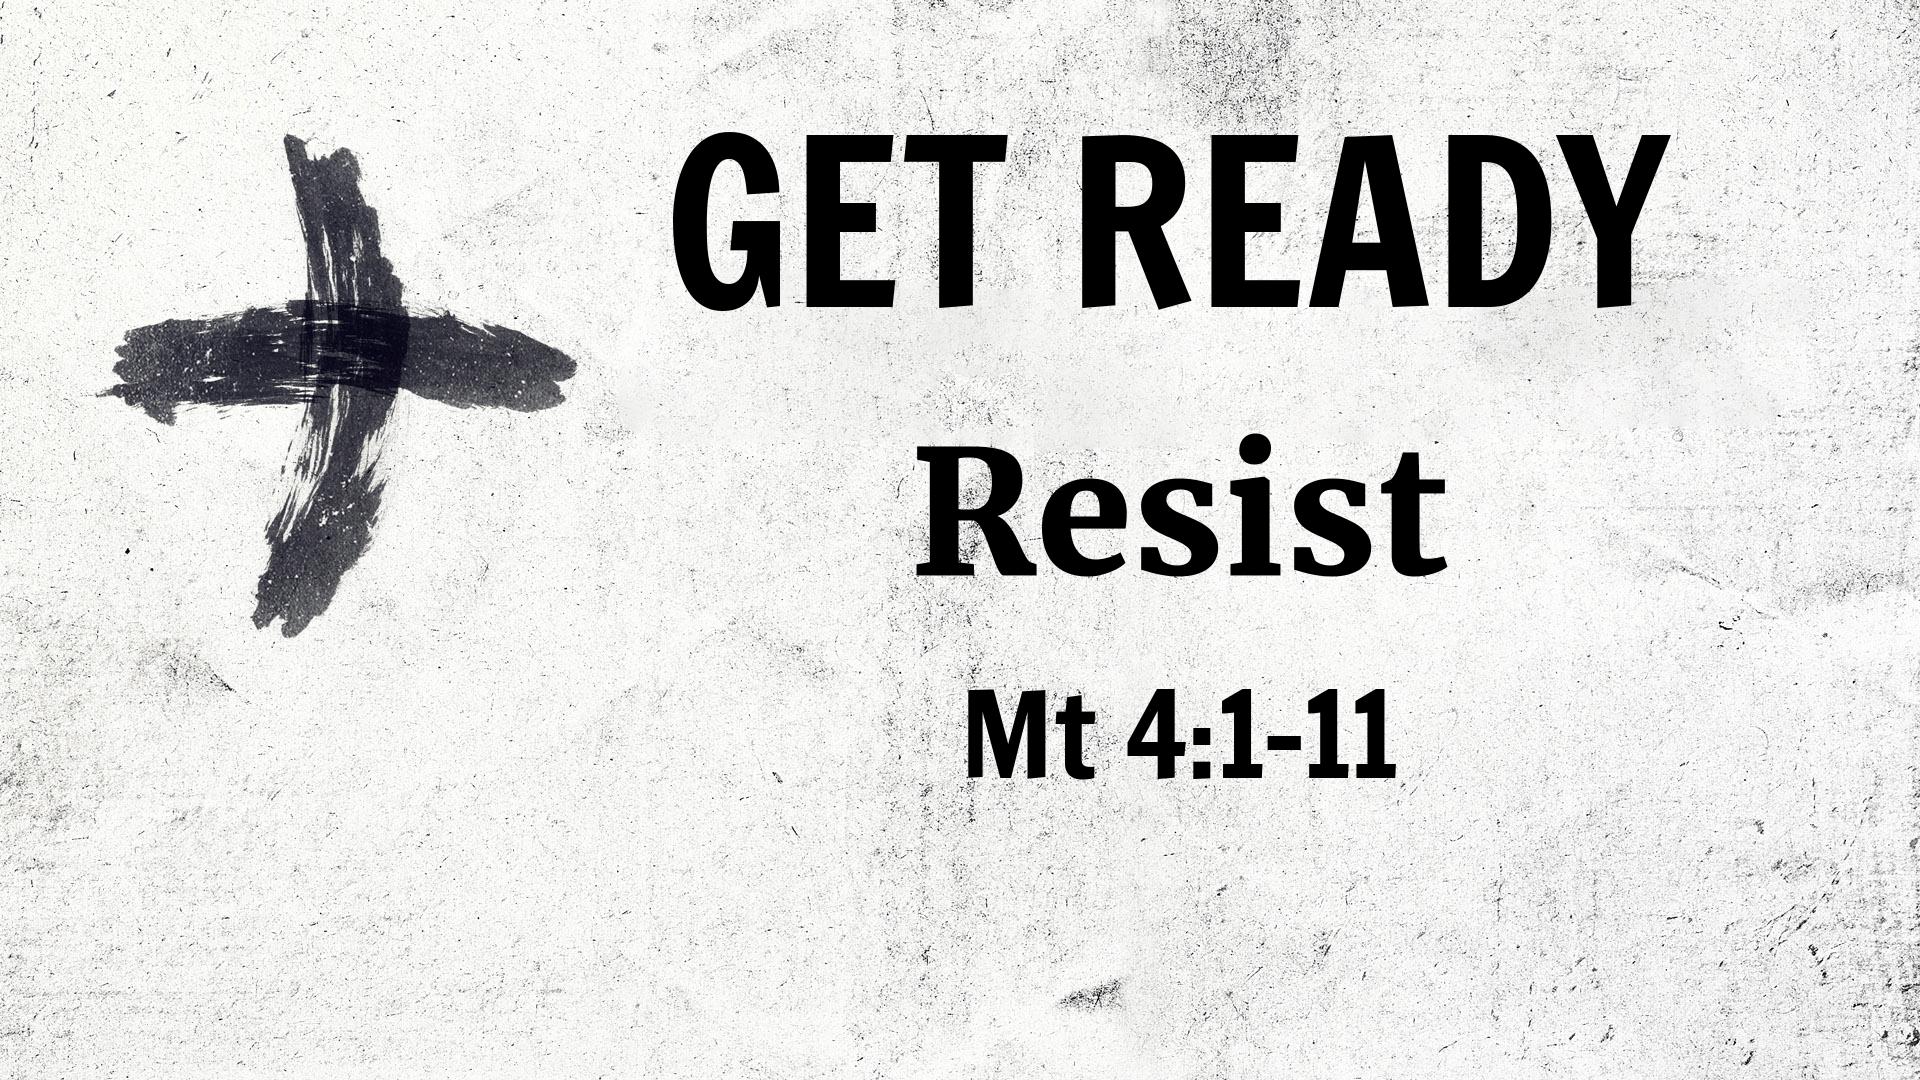 Get Ready - Resist